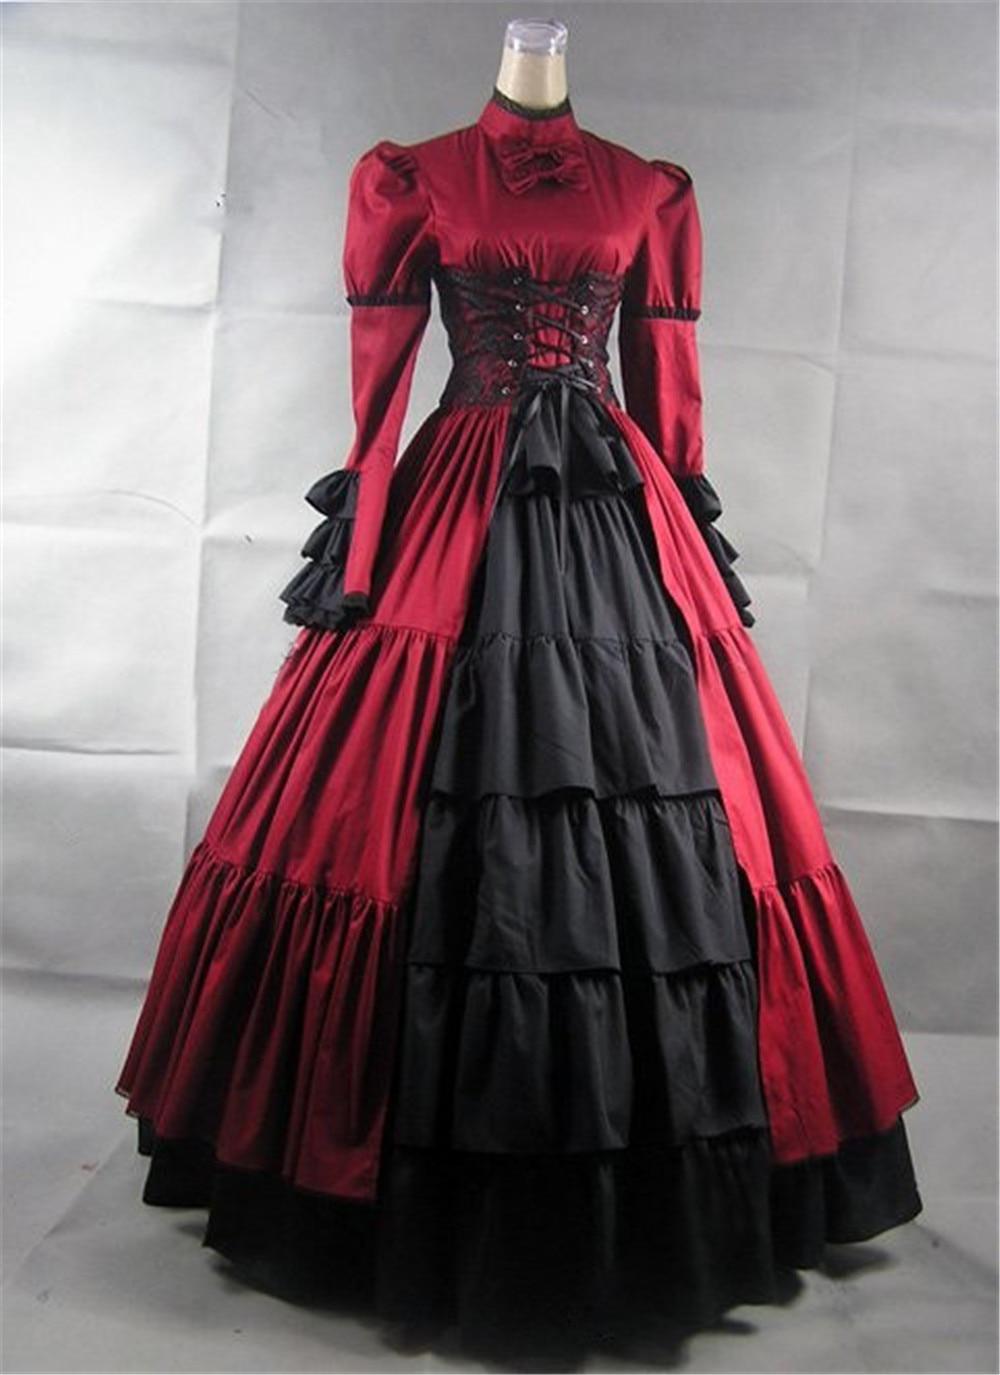 Women Fashion Vintage Style Women Medieval Dress Gothic Dress Floor Length Women Cosplay Dress Retro Long Gown Dress